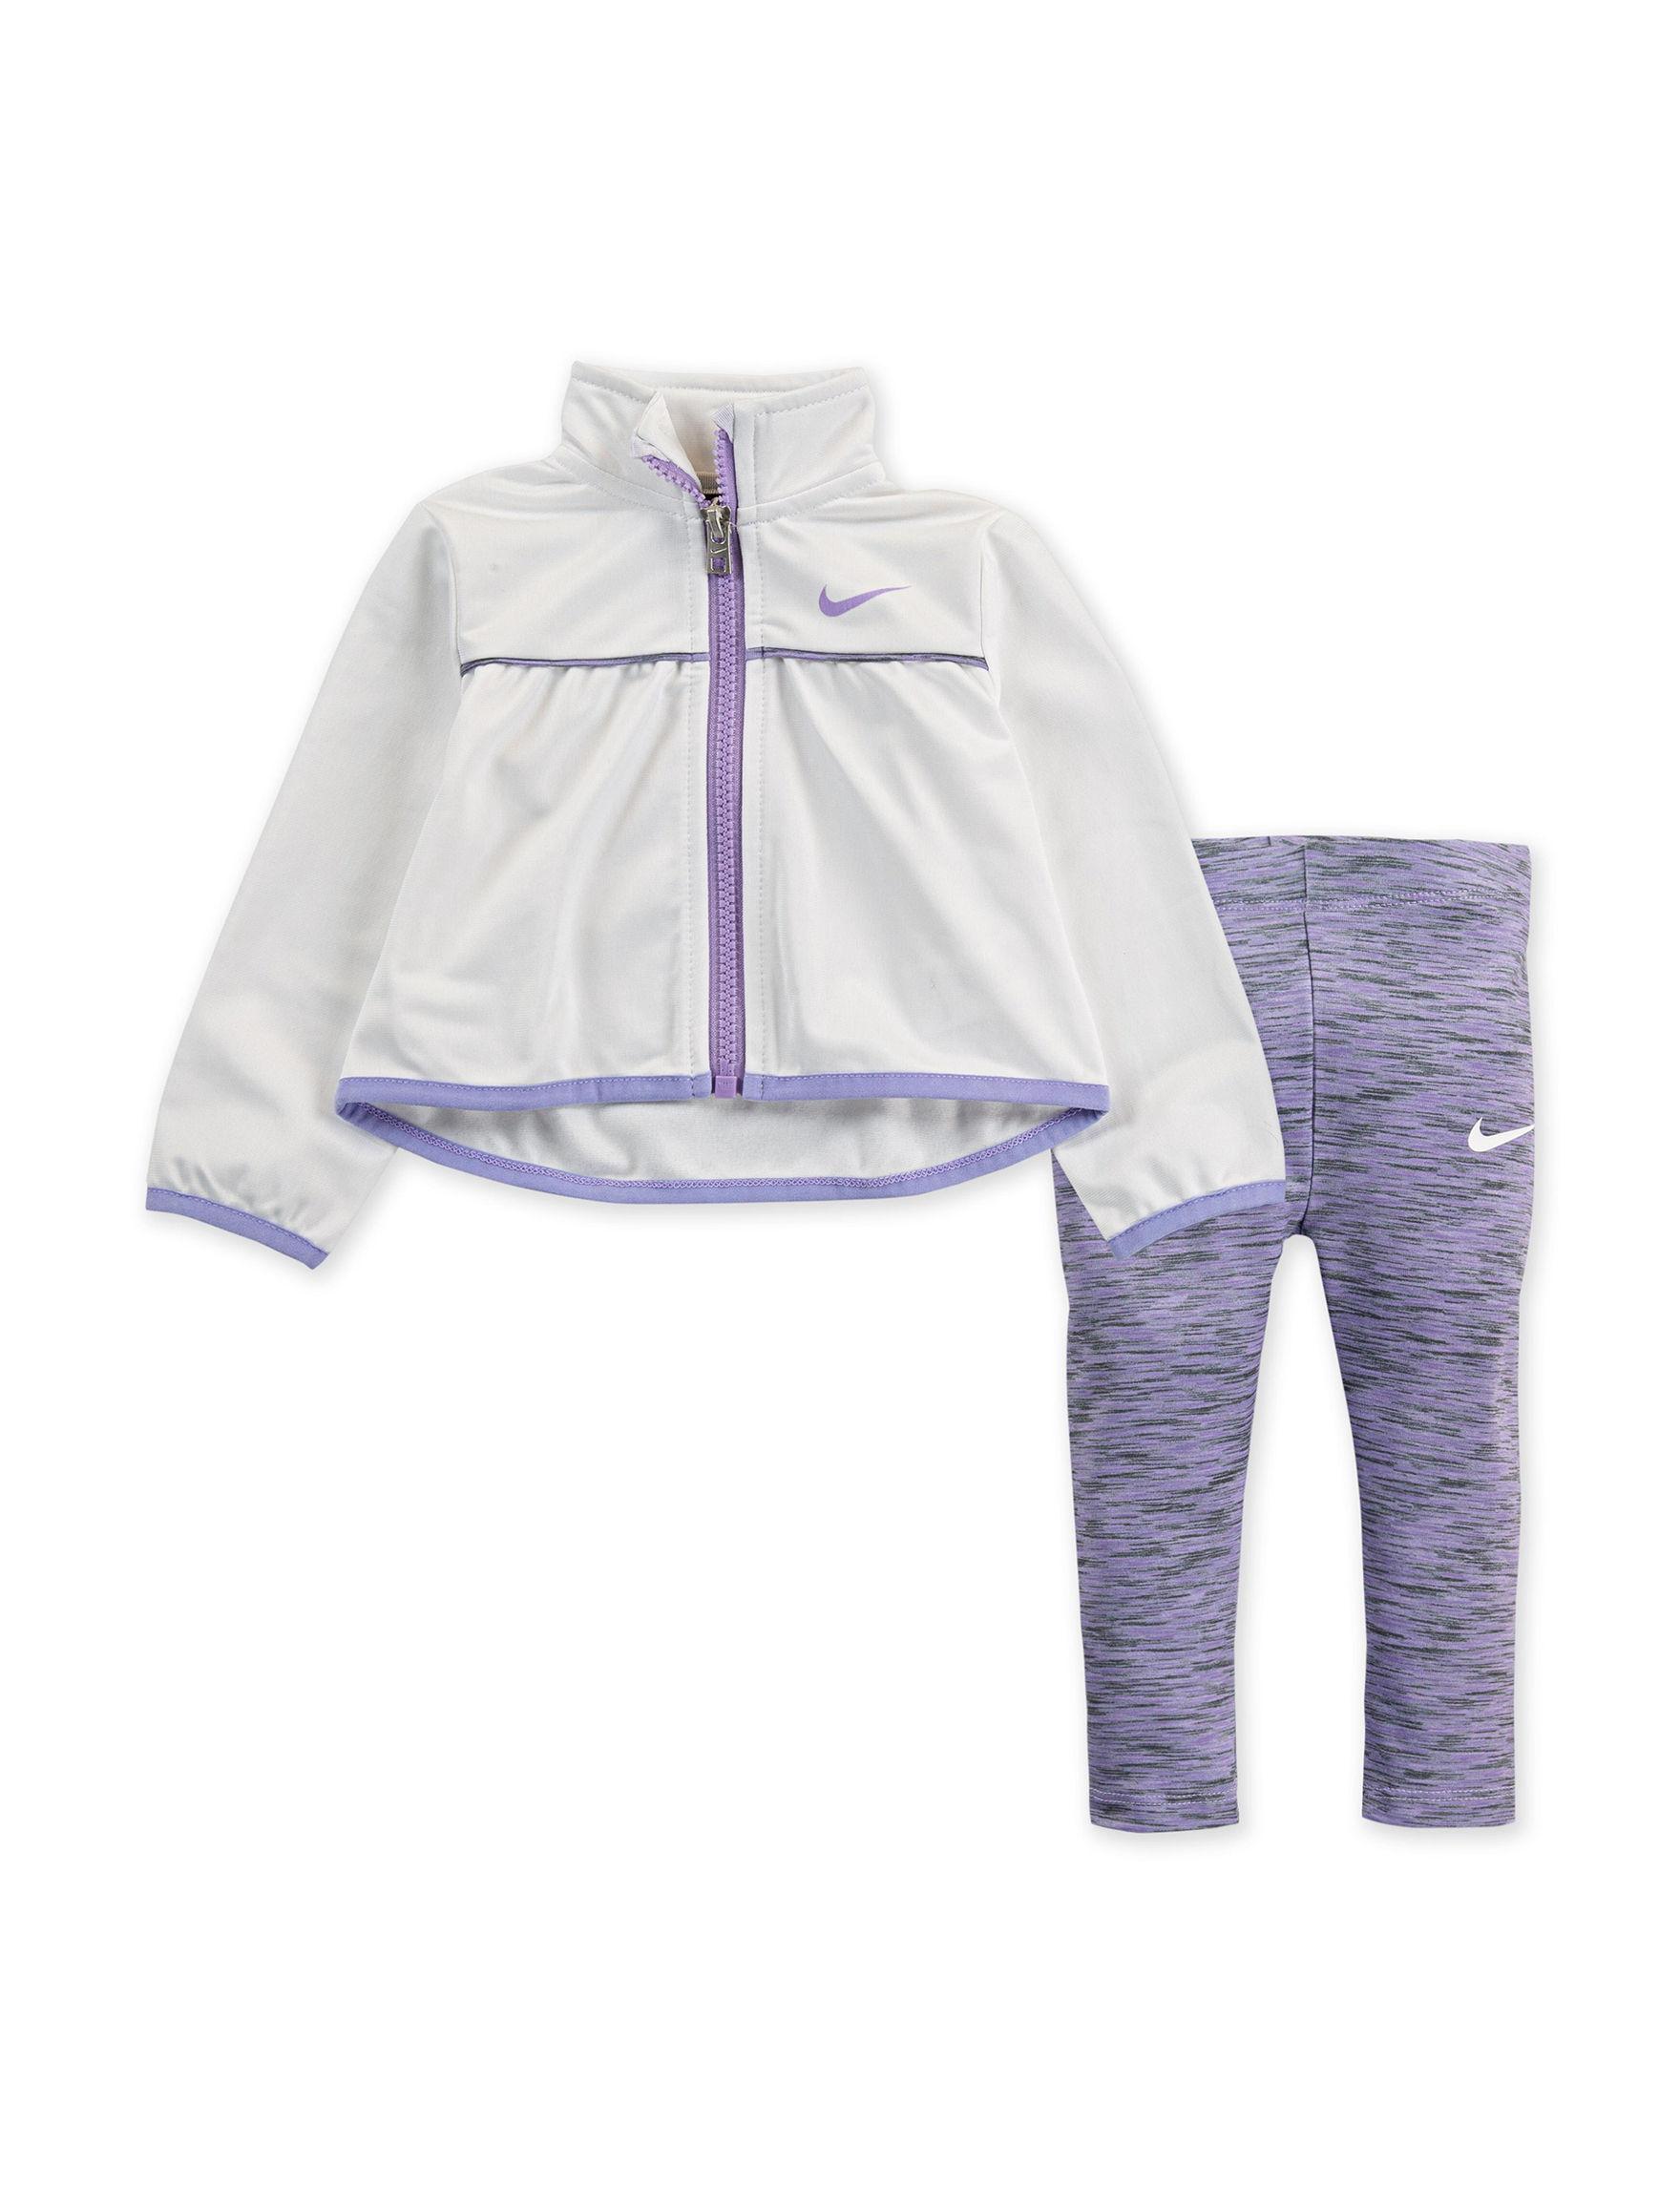 Nike Purple / White